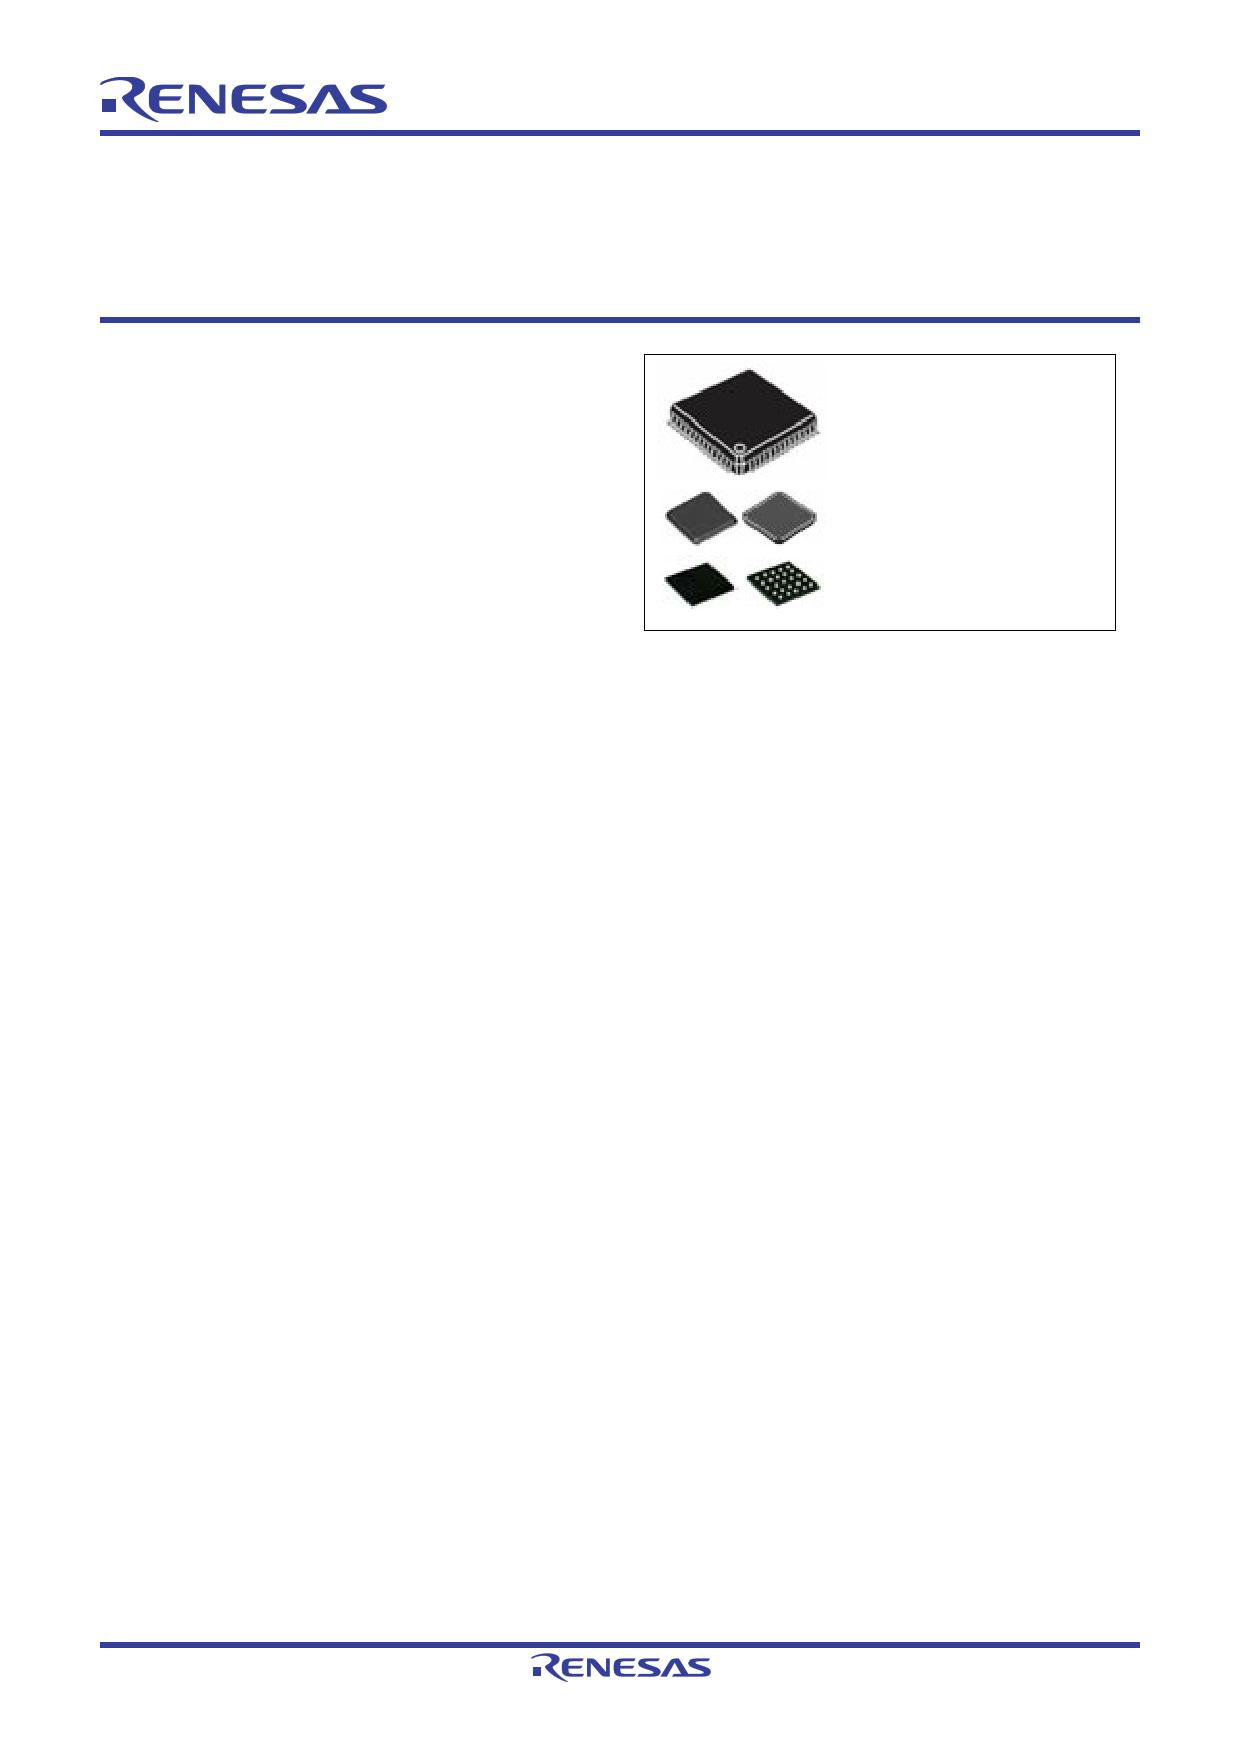 R5F51103ADFK 데이터시트 및 R5F51103ADFK PDF